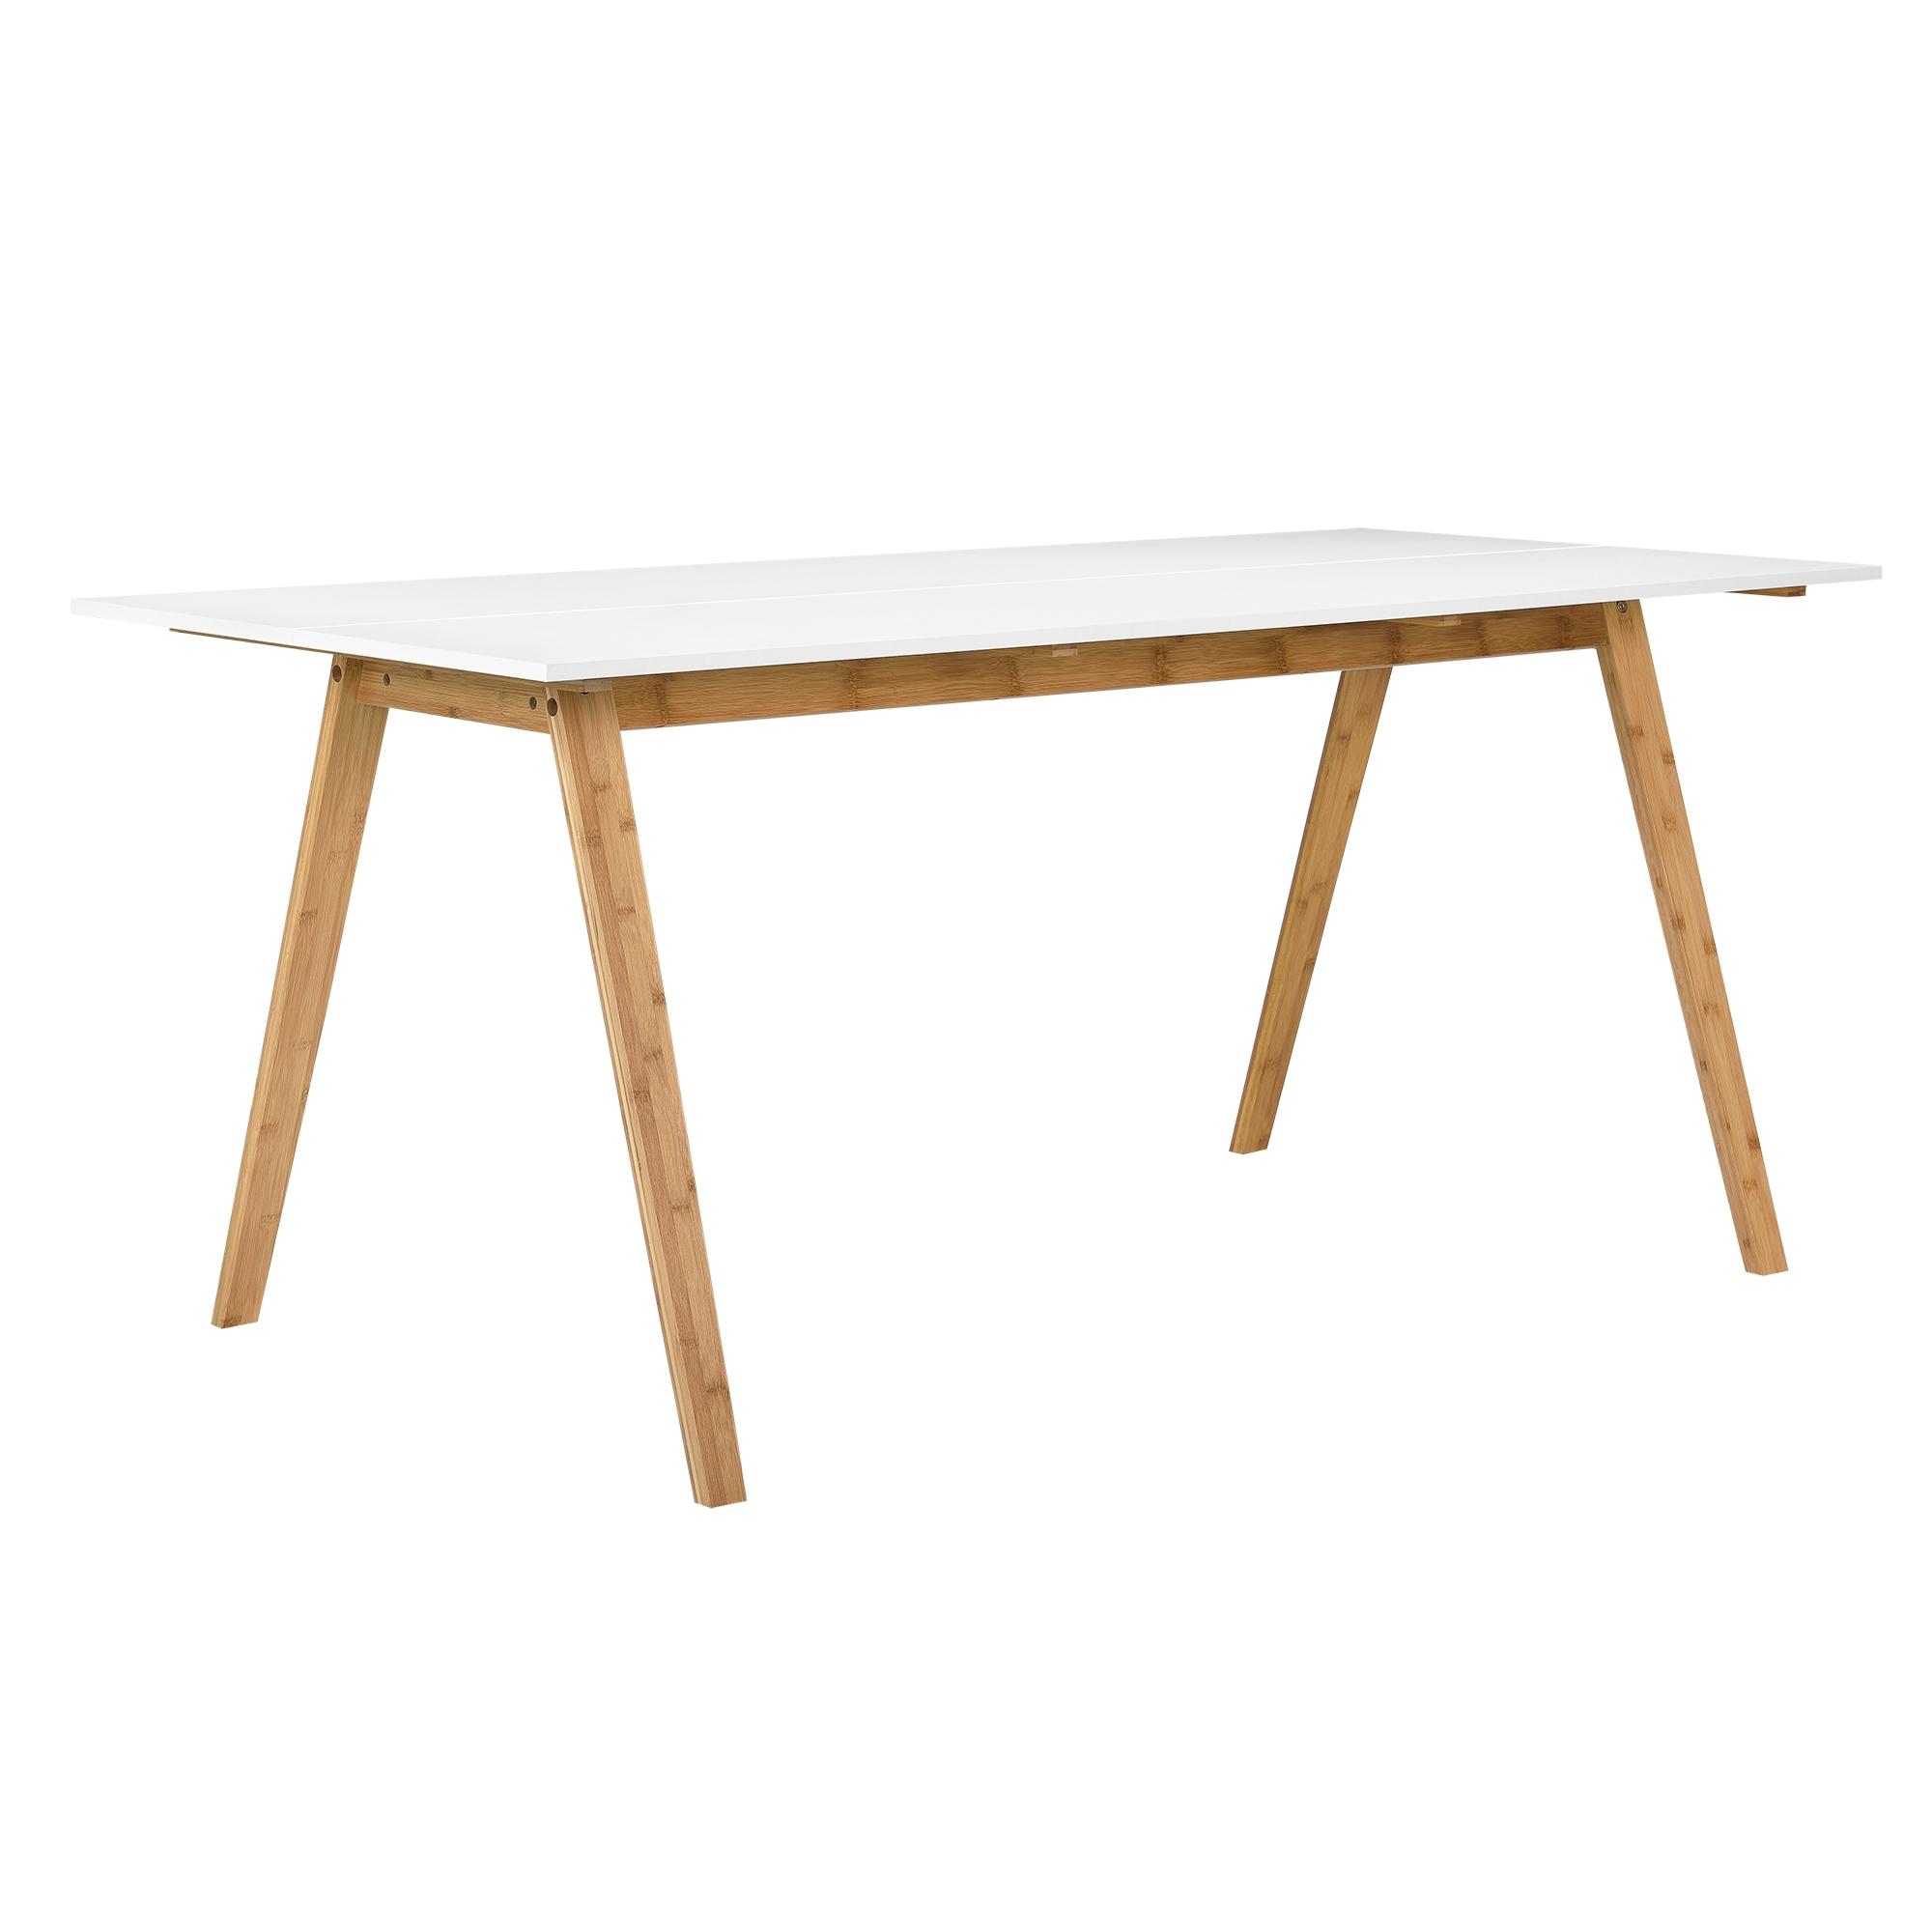 6x design st hle esszimmer grau stuhl holz for Design stuhl leder holz